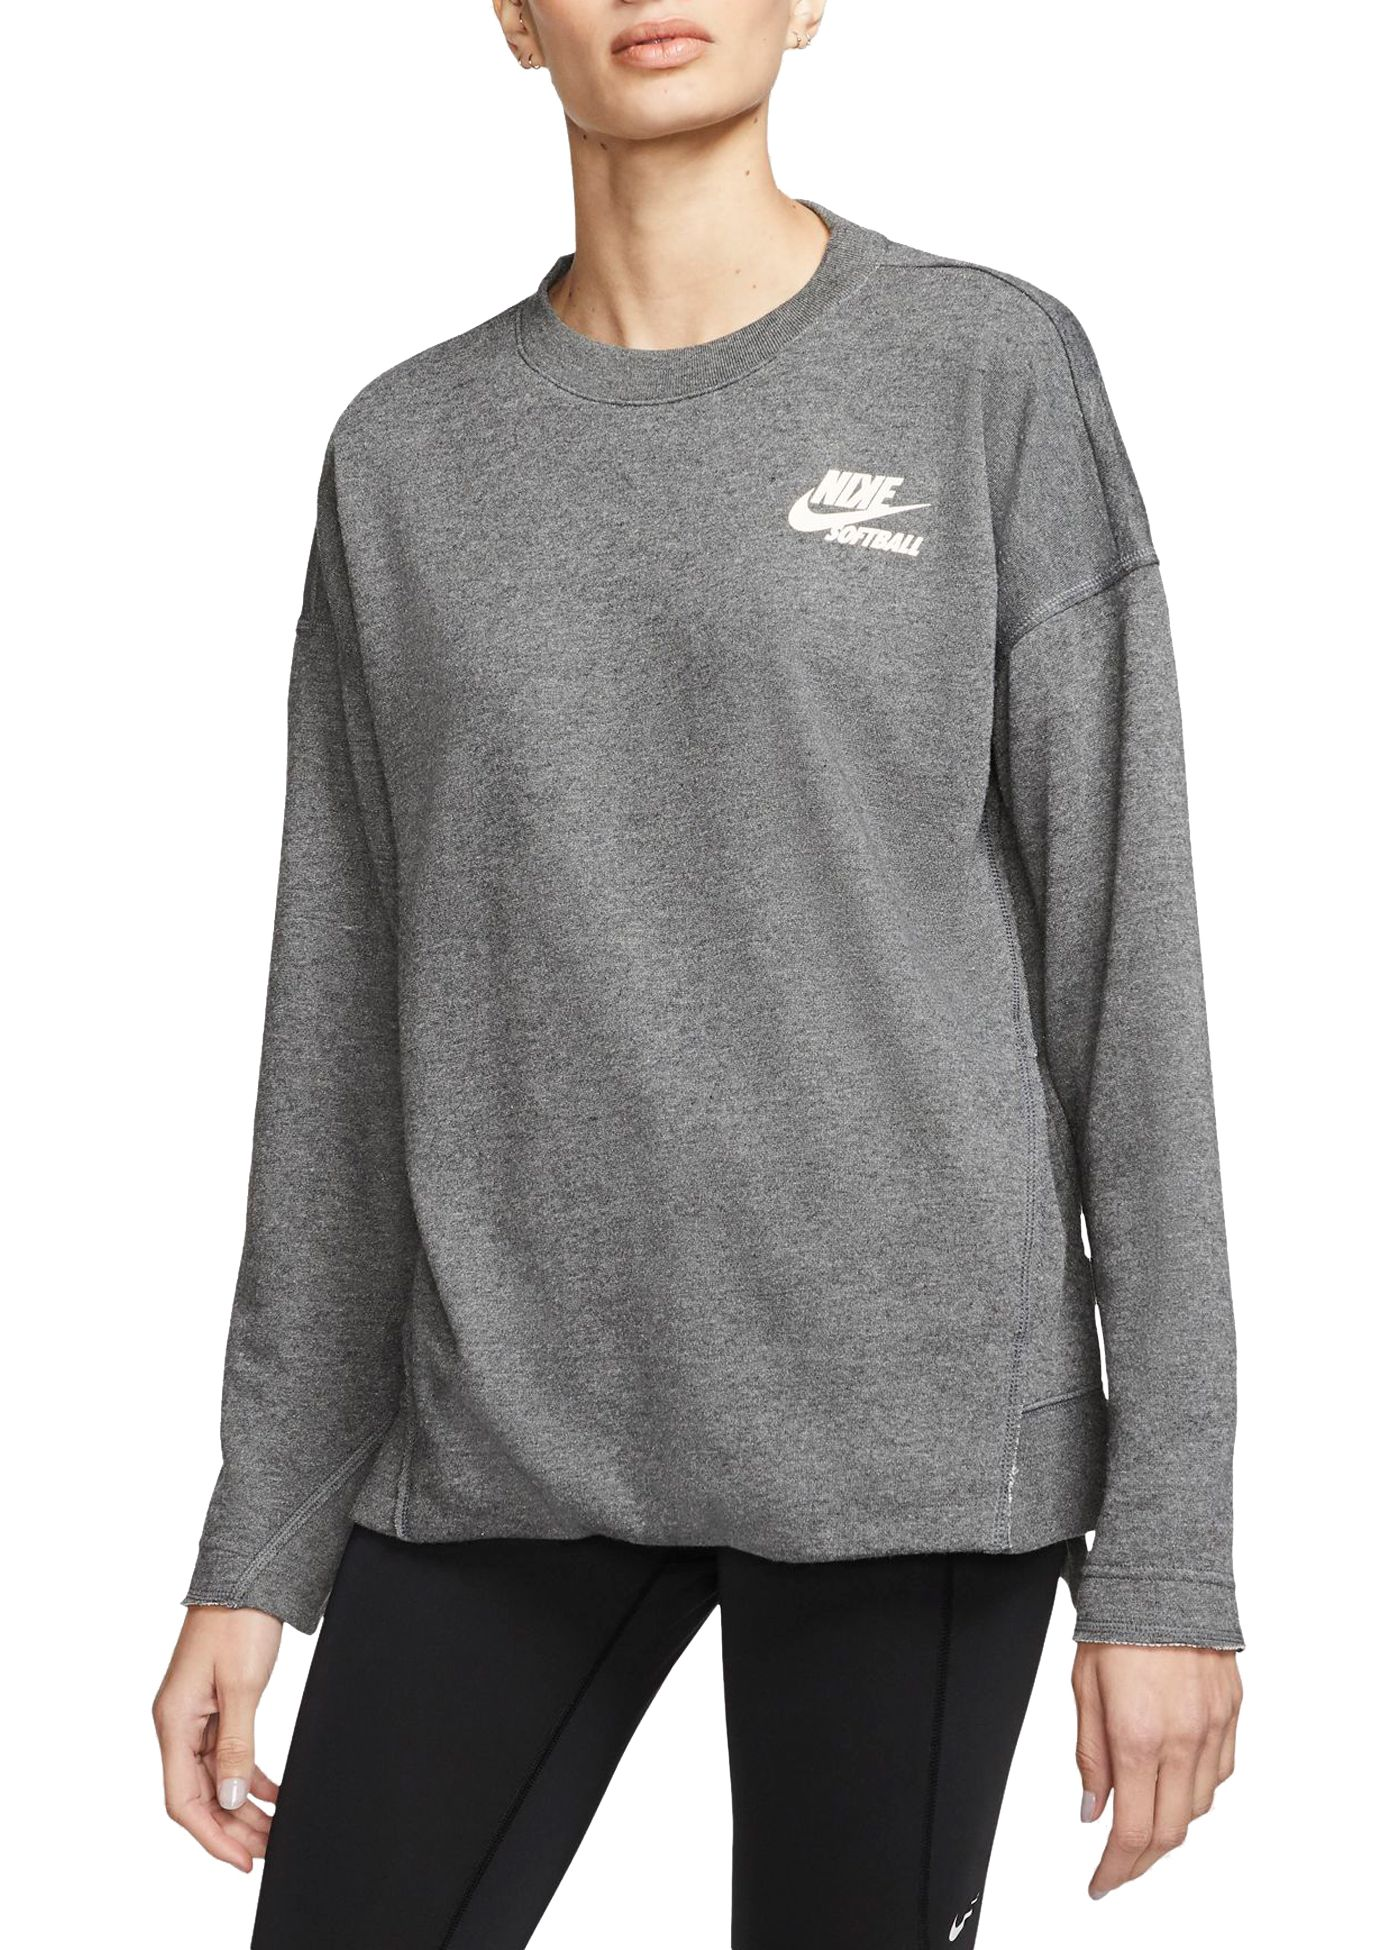 Nike Women's Long-Sleeve Softball Crew Shirt